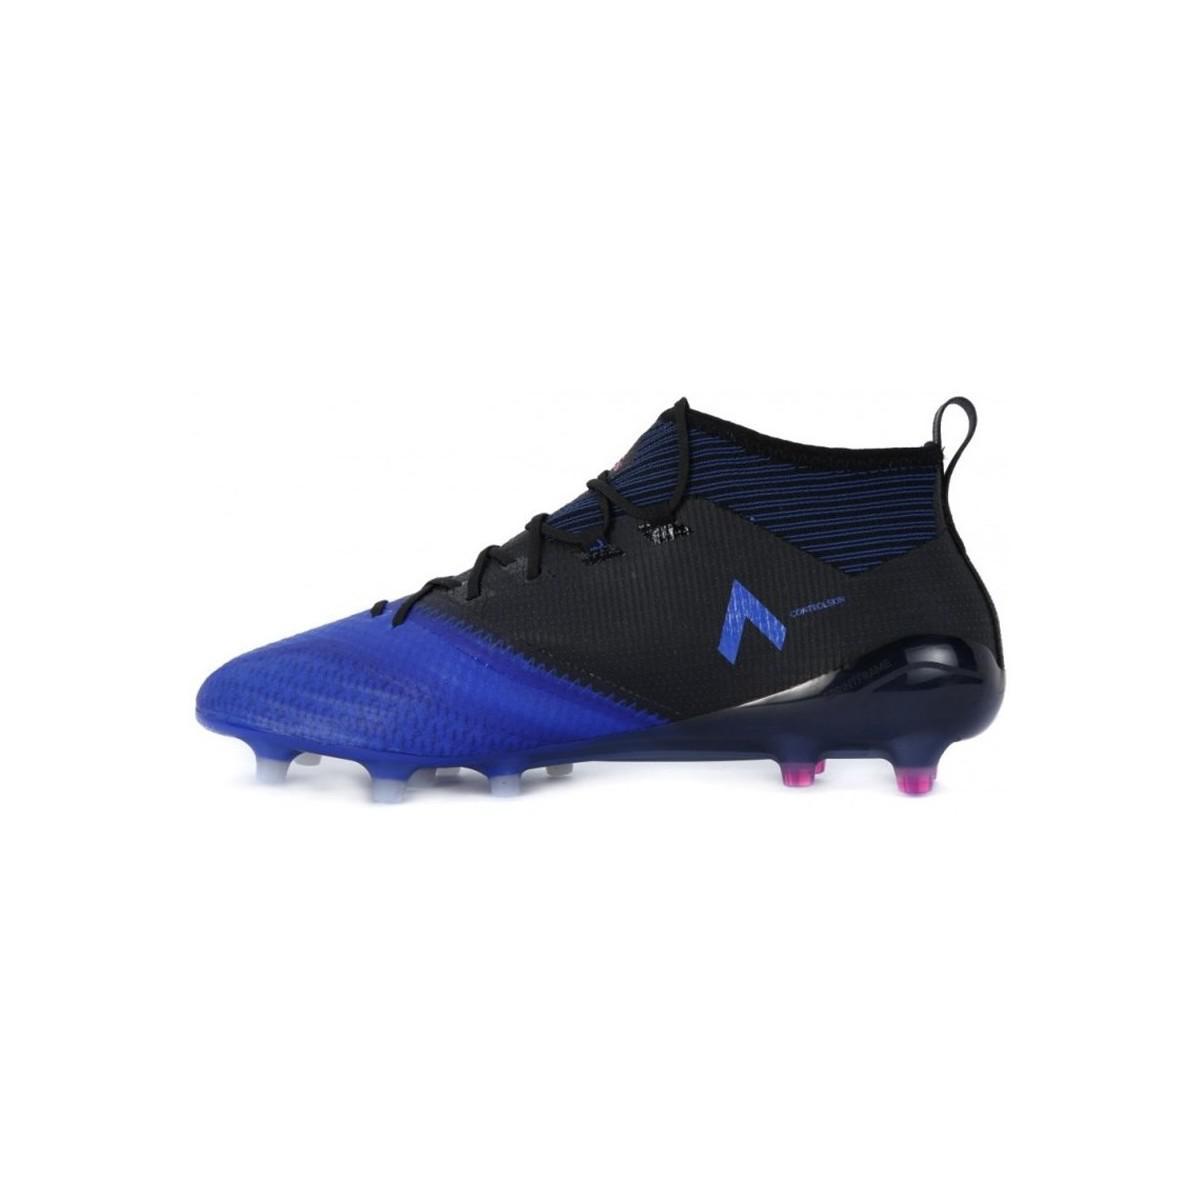 4c0a961e848 Adidas - Ace 171 Primeknit Fg Men s Football Boots In Black for Men - Lyst.  View fullscreen